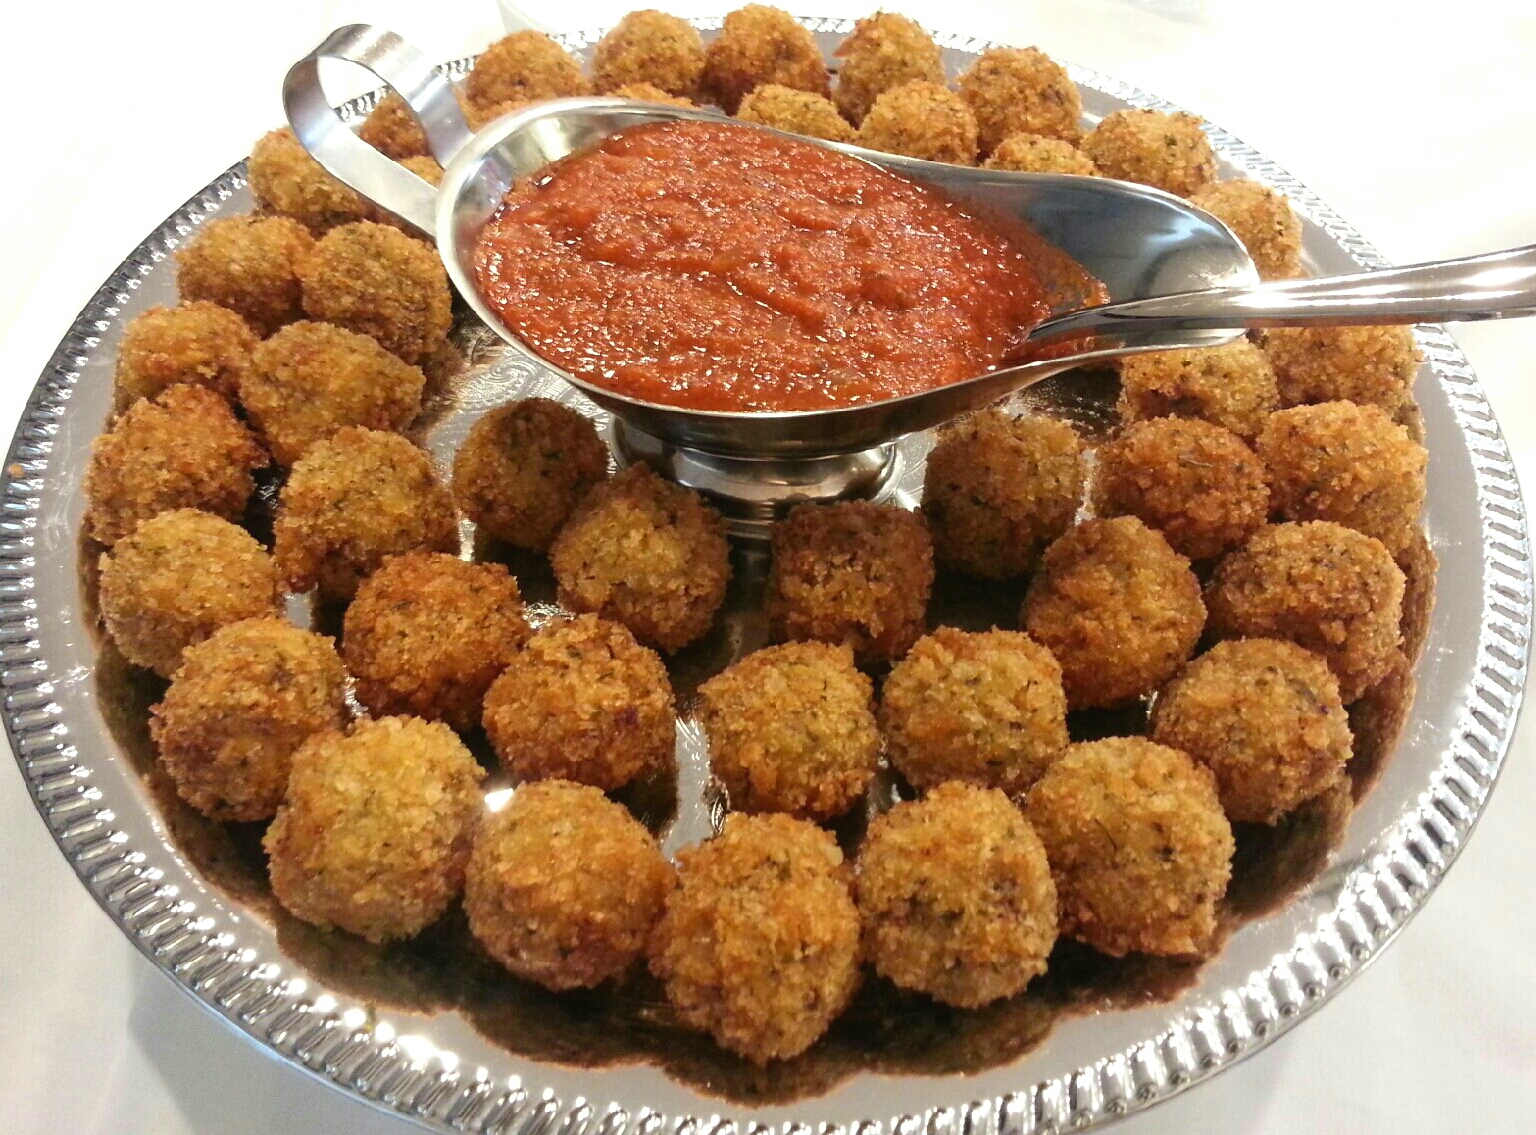 Meatball Platter